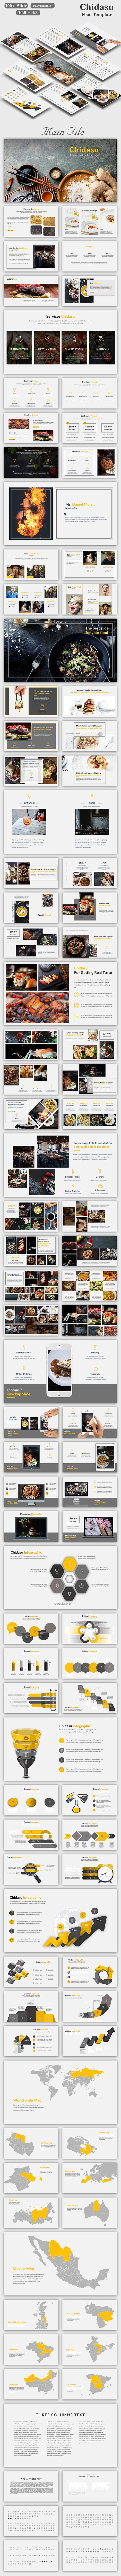 Chidasu Food Google Slide Template - Google Slides Presentation Templates